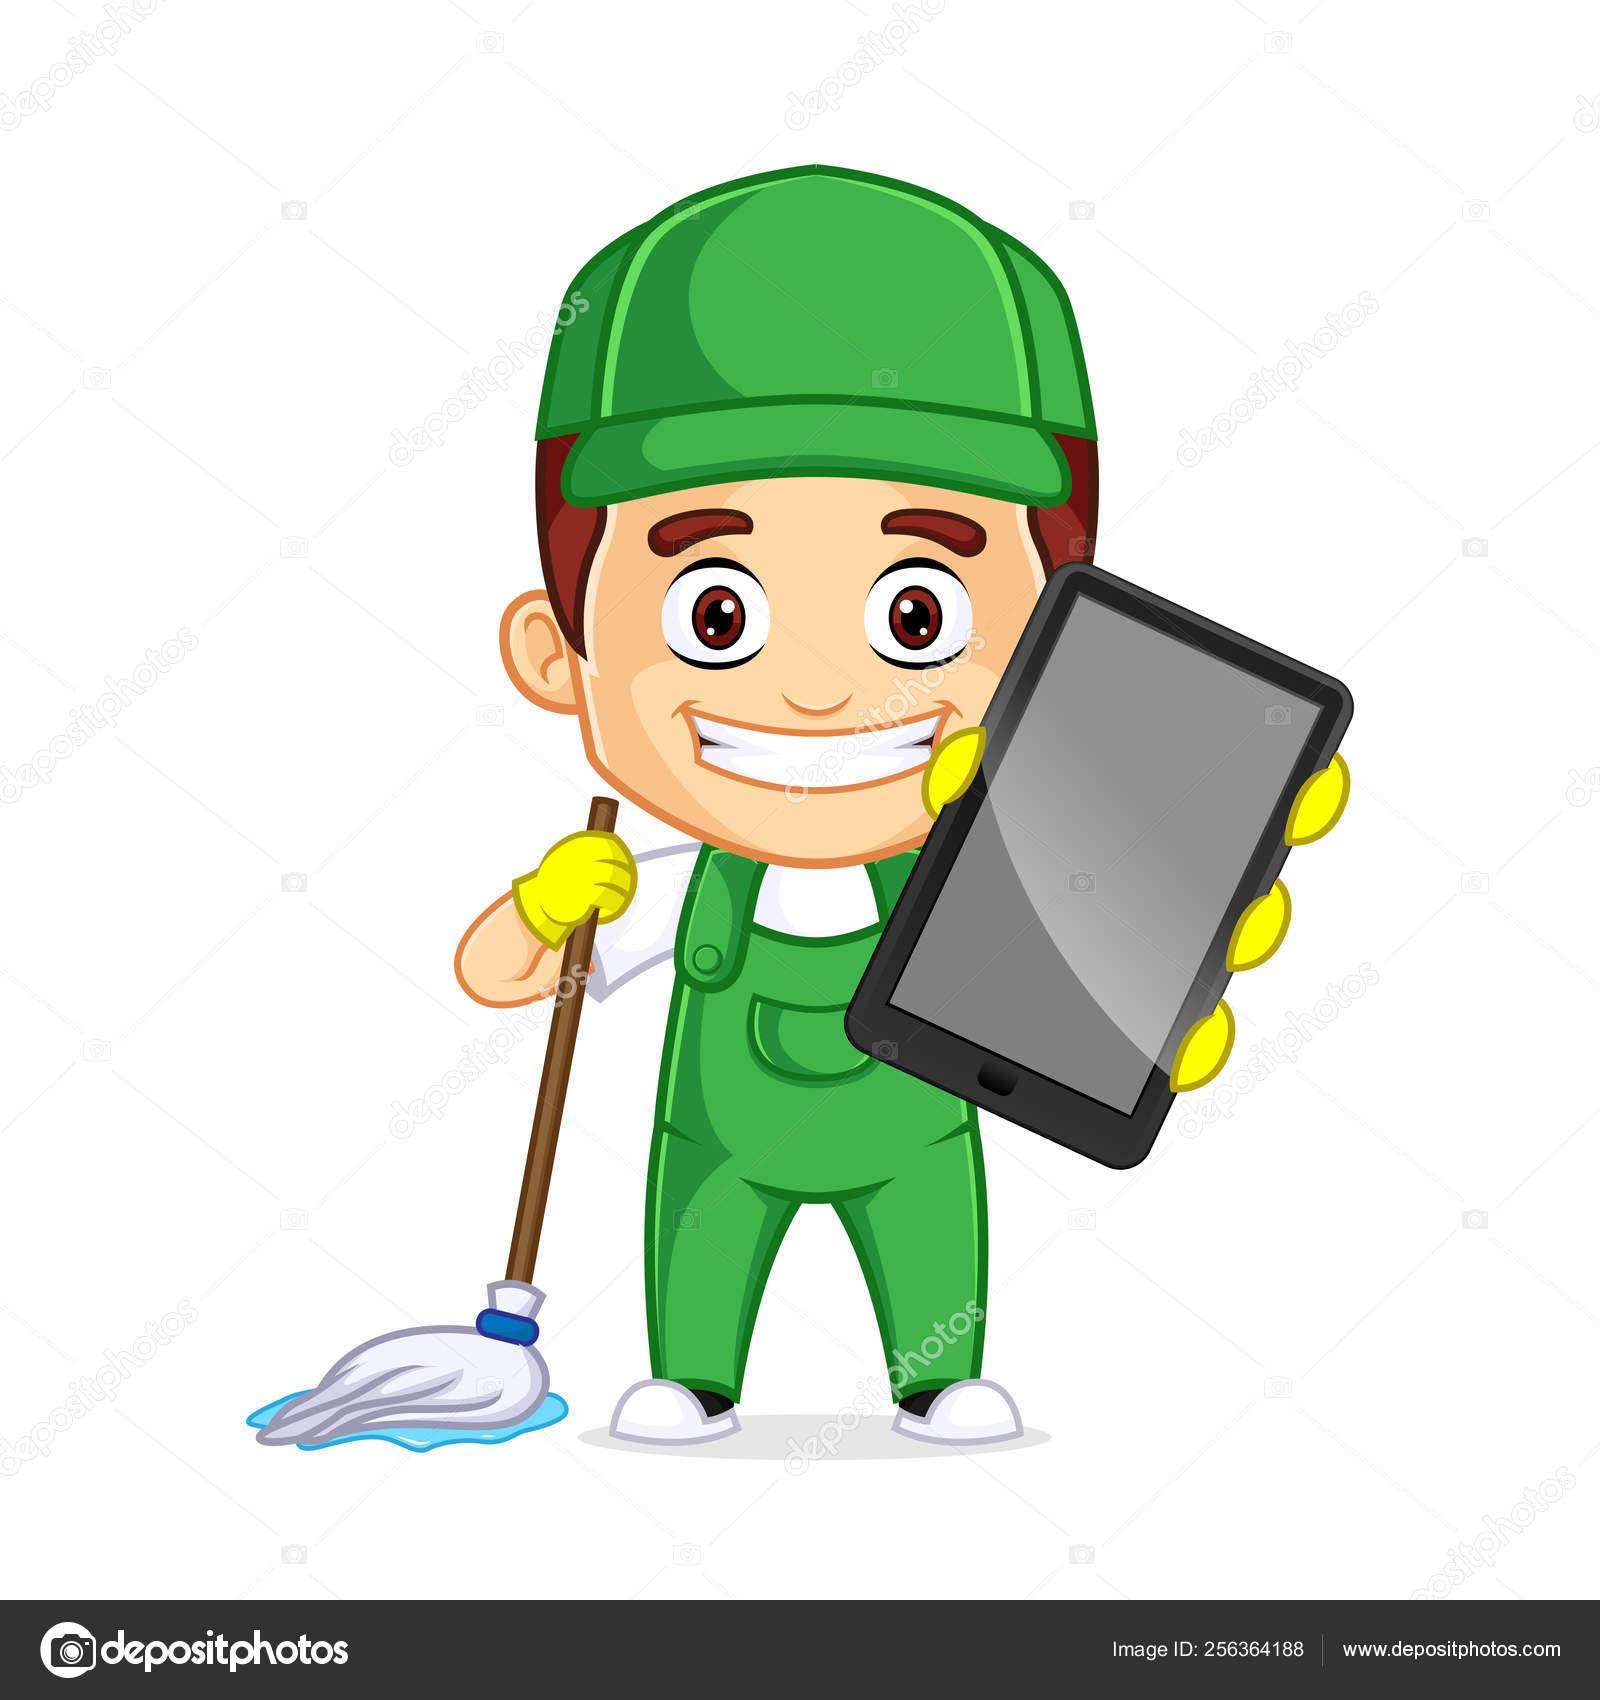 hight resolution of servicio de limpieza clipart cartoon mascot vector de stock